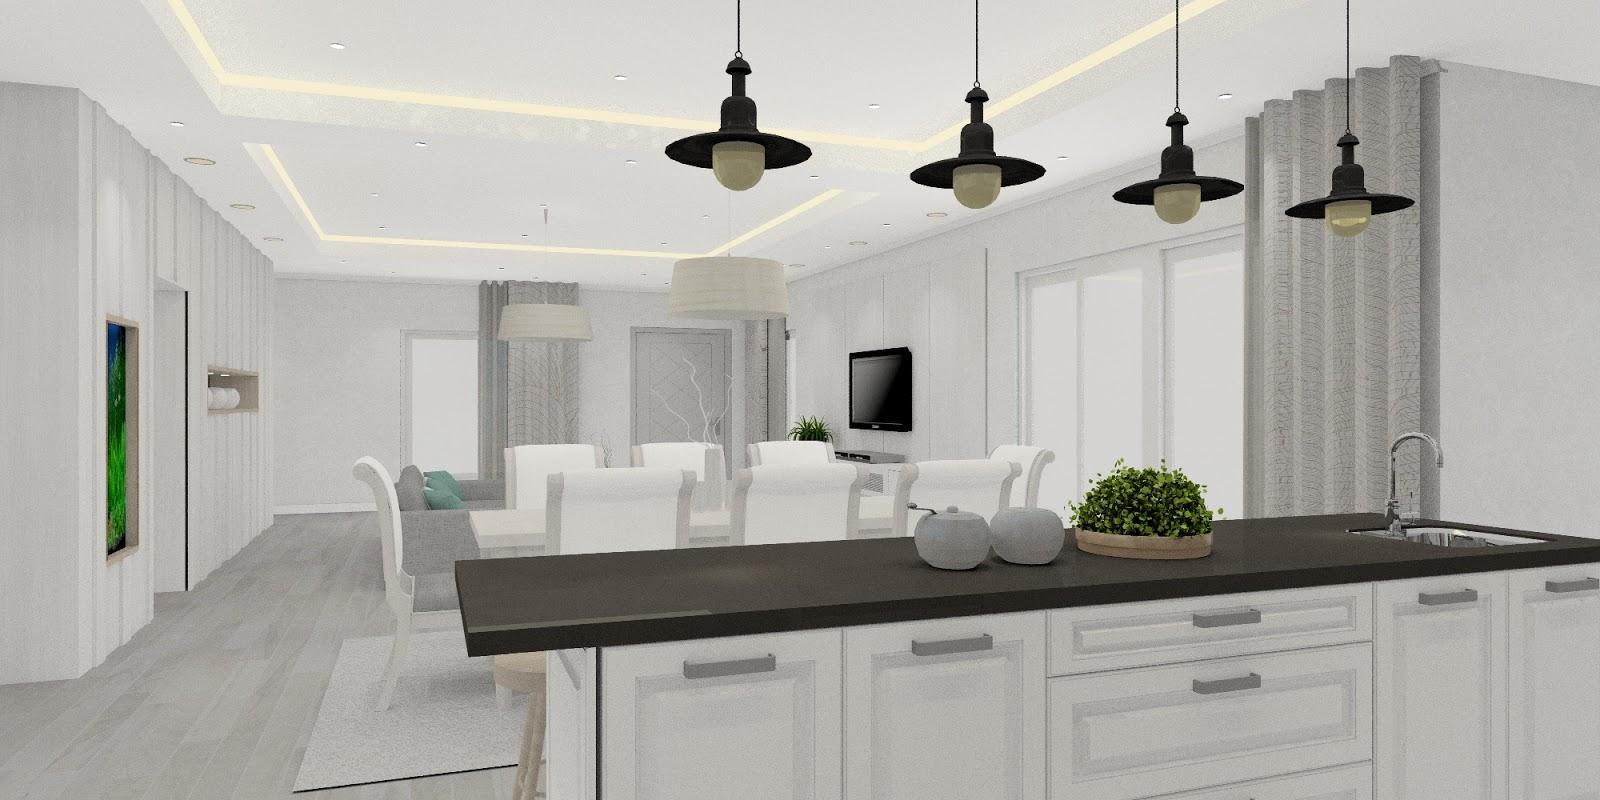 Inspiration through creative interior designs: Modern Rustic Design ...